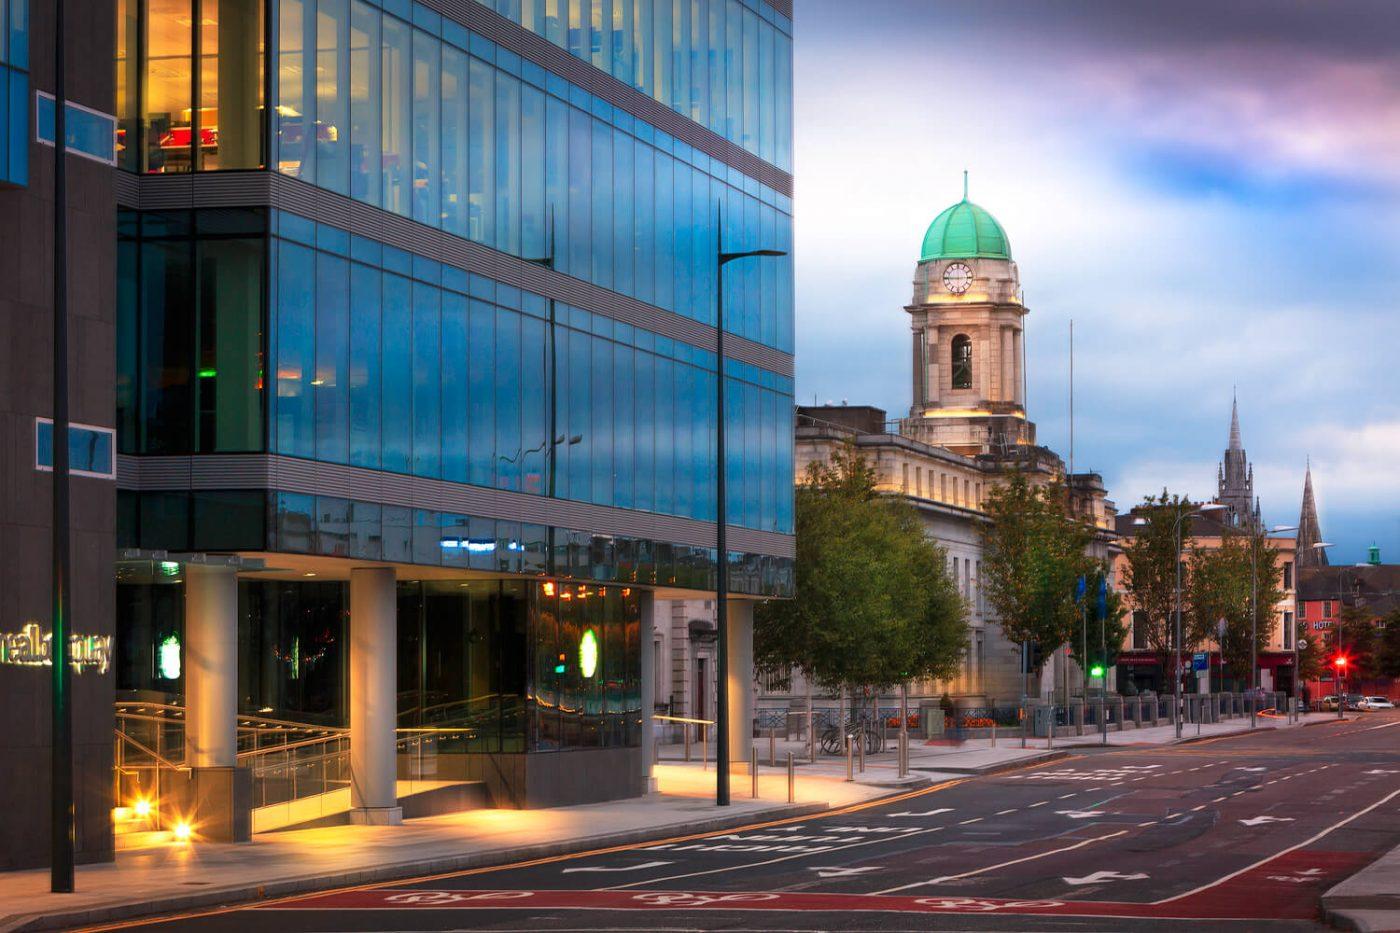 Jim McCarthy Photographer Cork - Photography Prints - Albert Quay & City Hall Cork #4384